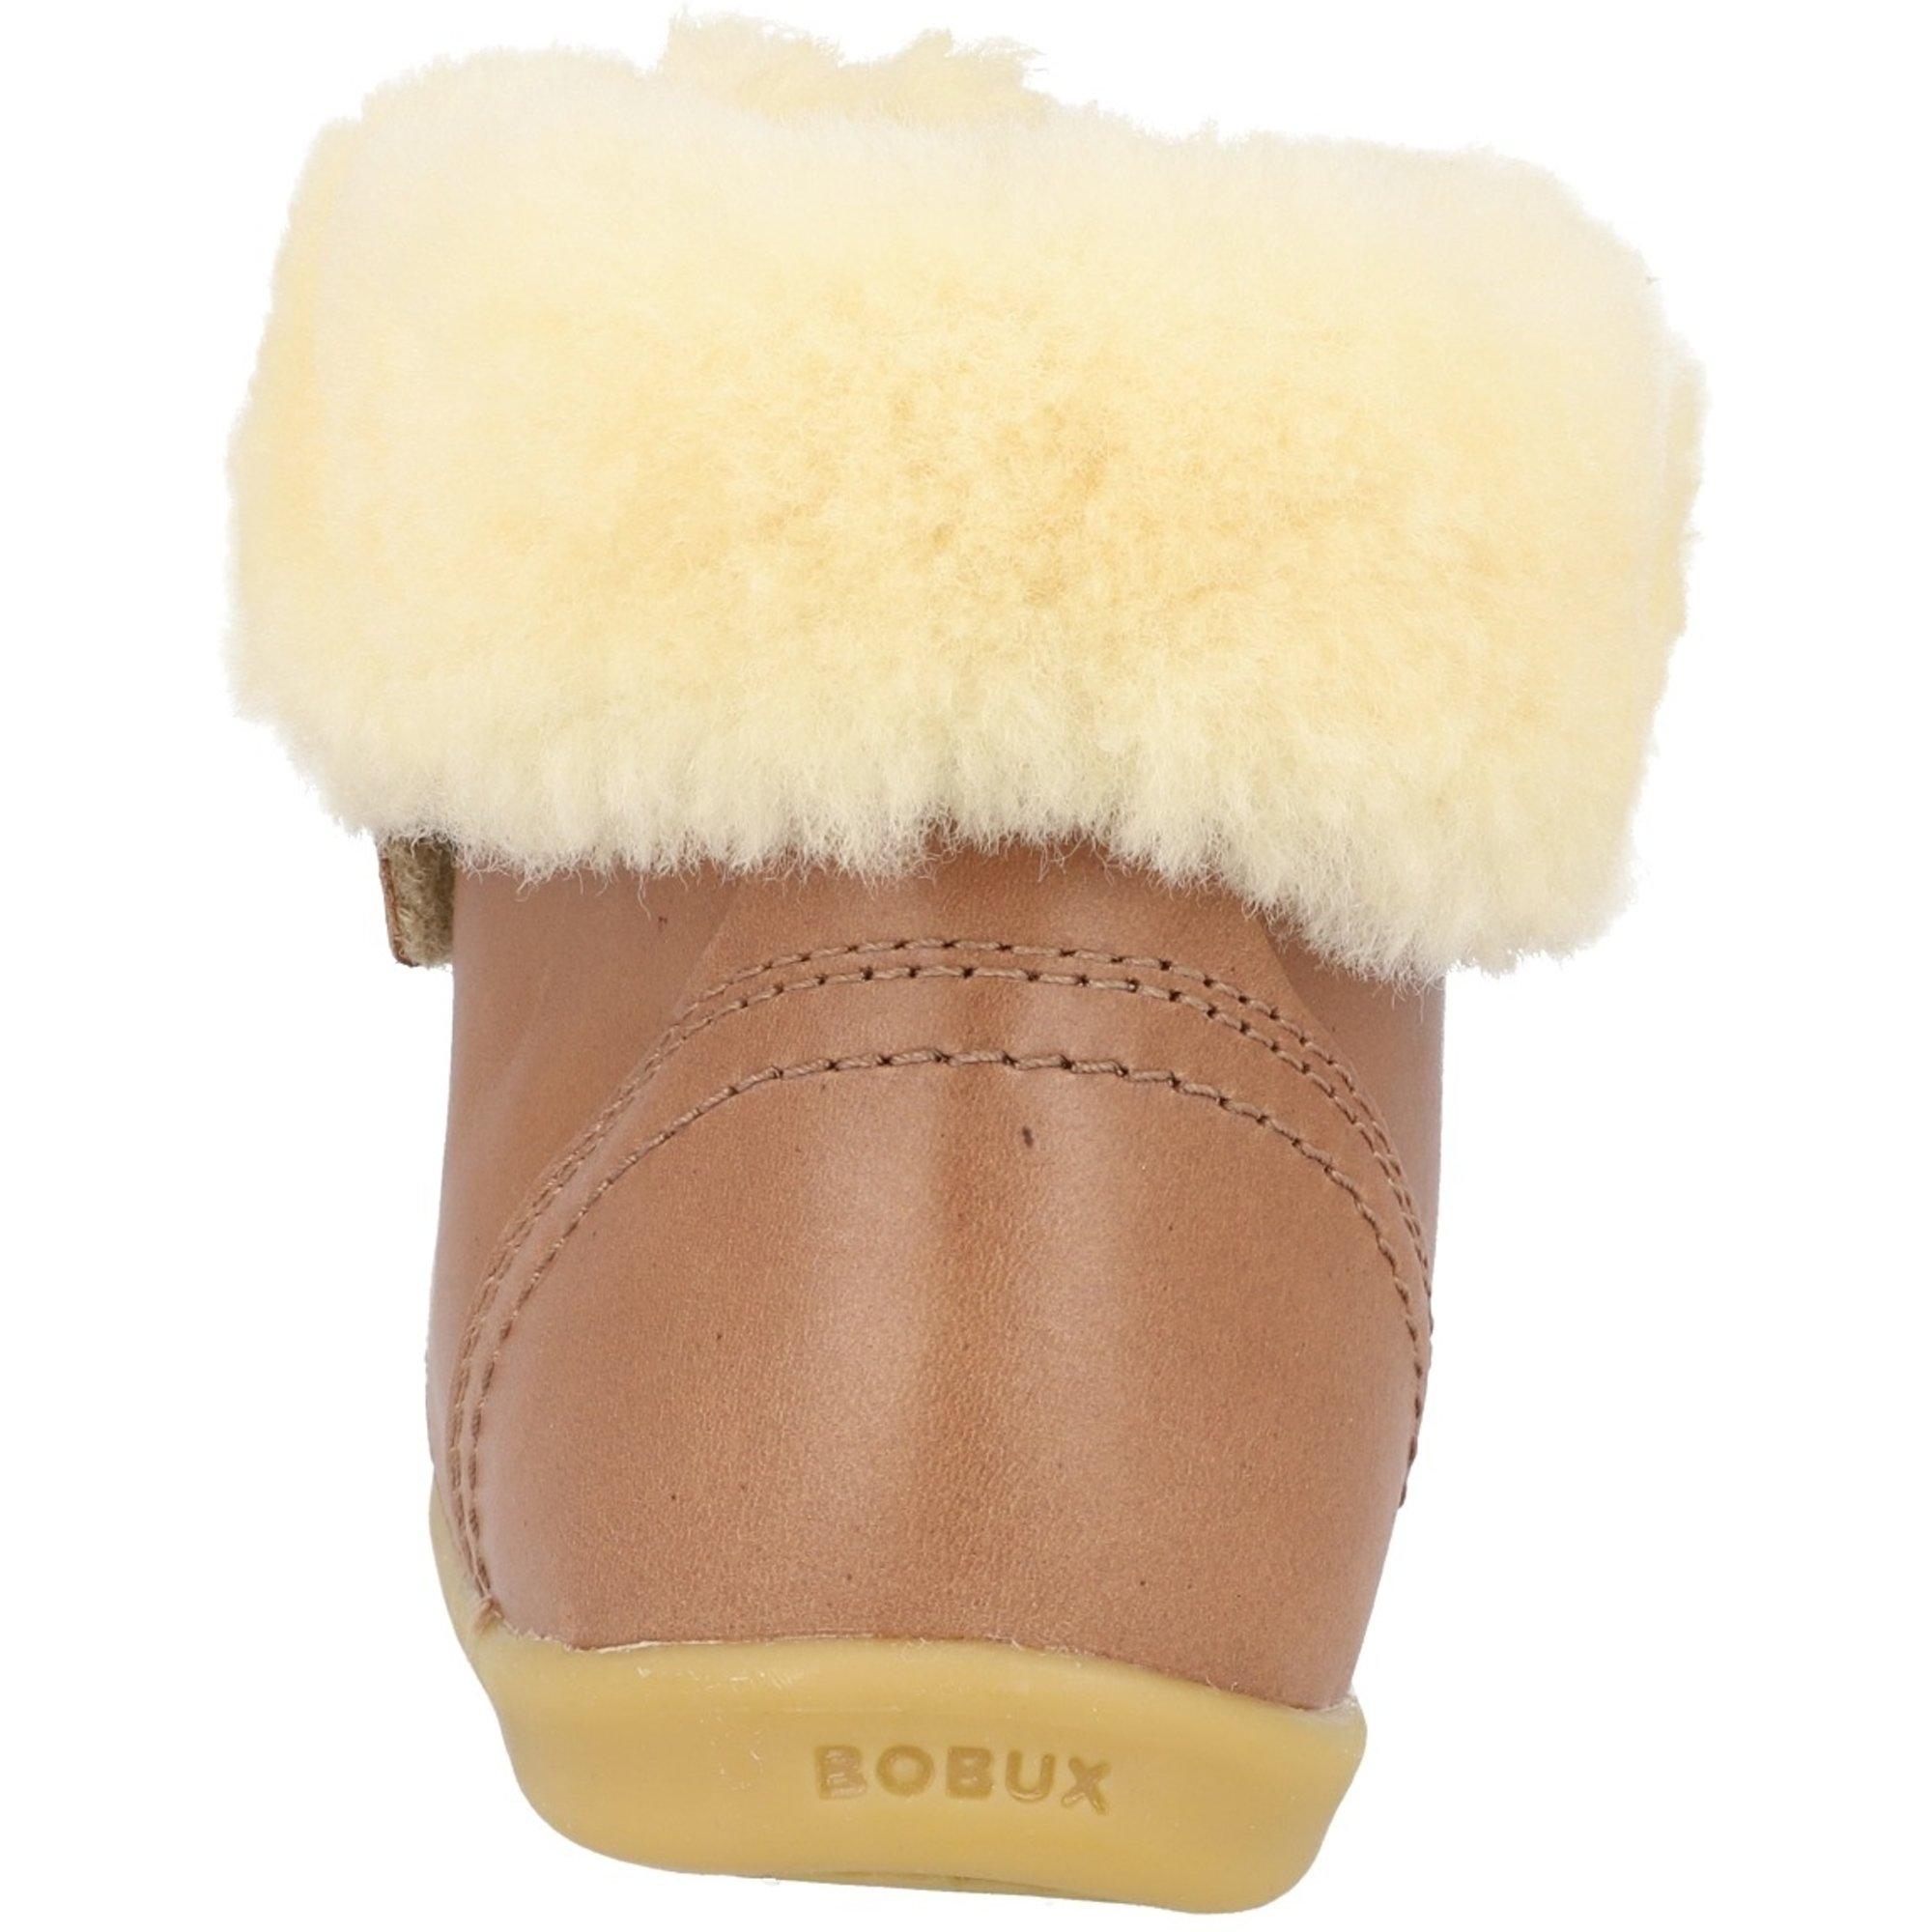 Bobux i-Walk Desert Arctic Caramel Vintage-Look Quickdry Leather